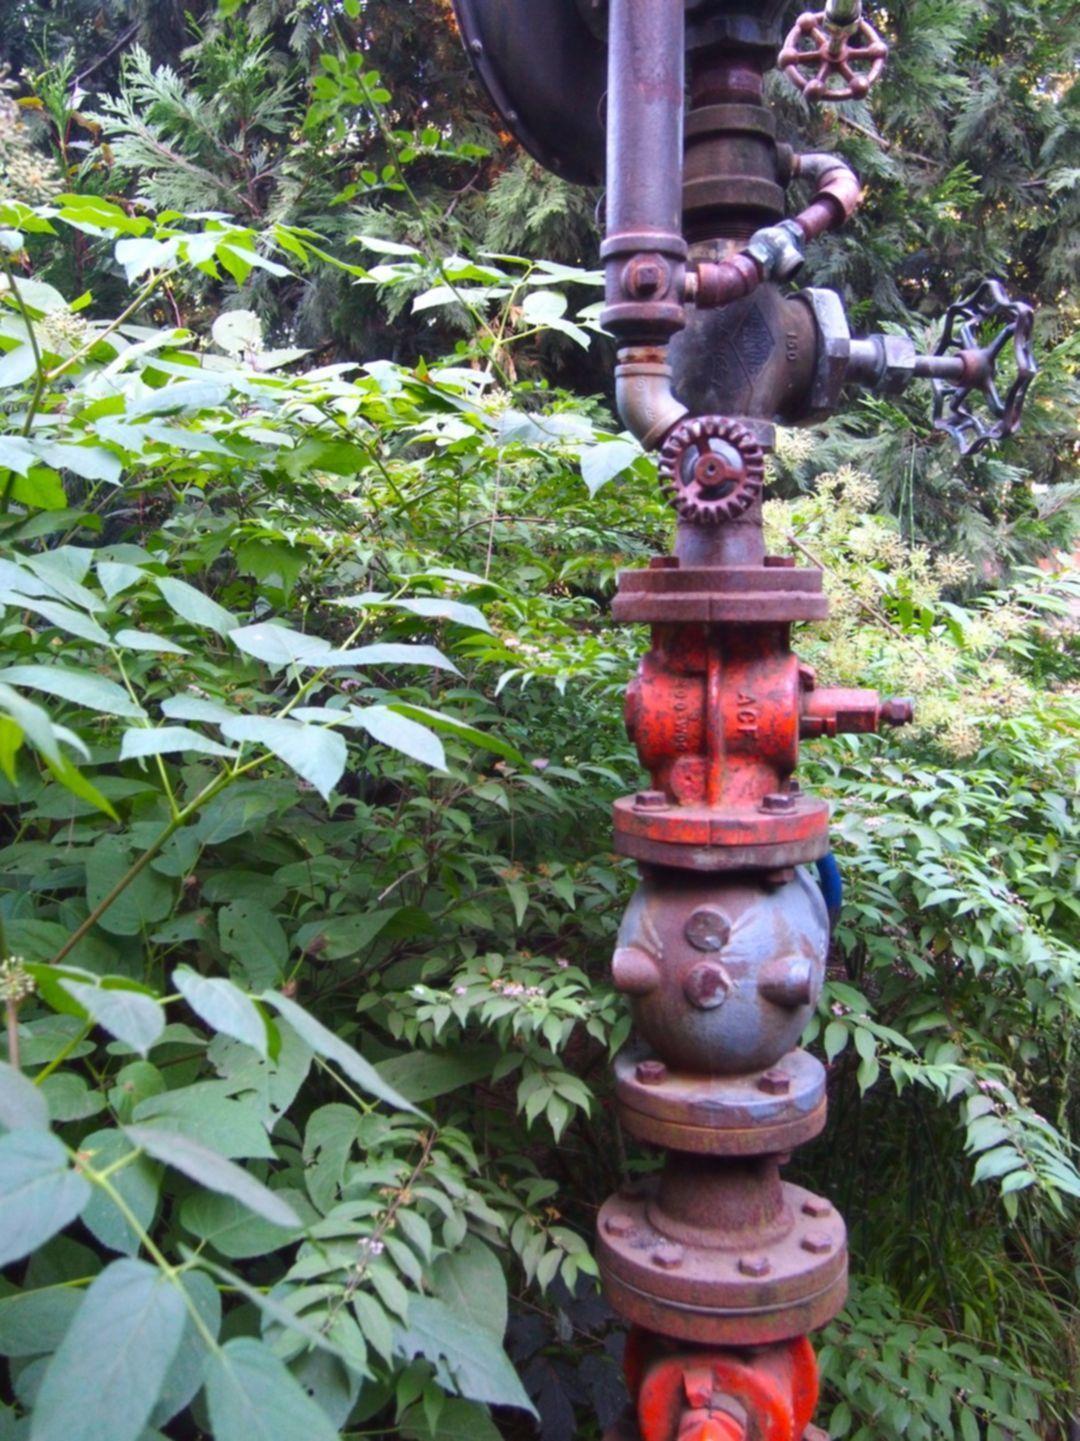 Easy 8 diy garden sculptures design ideas for amazing